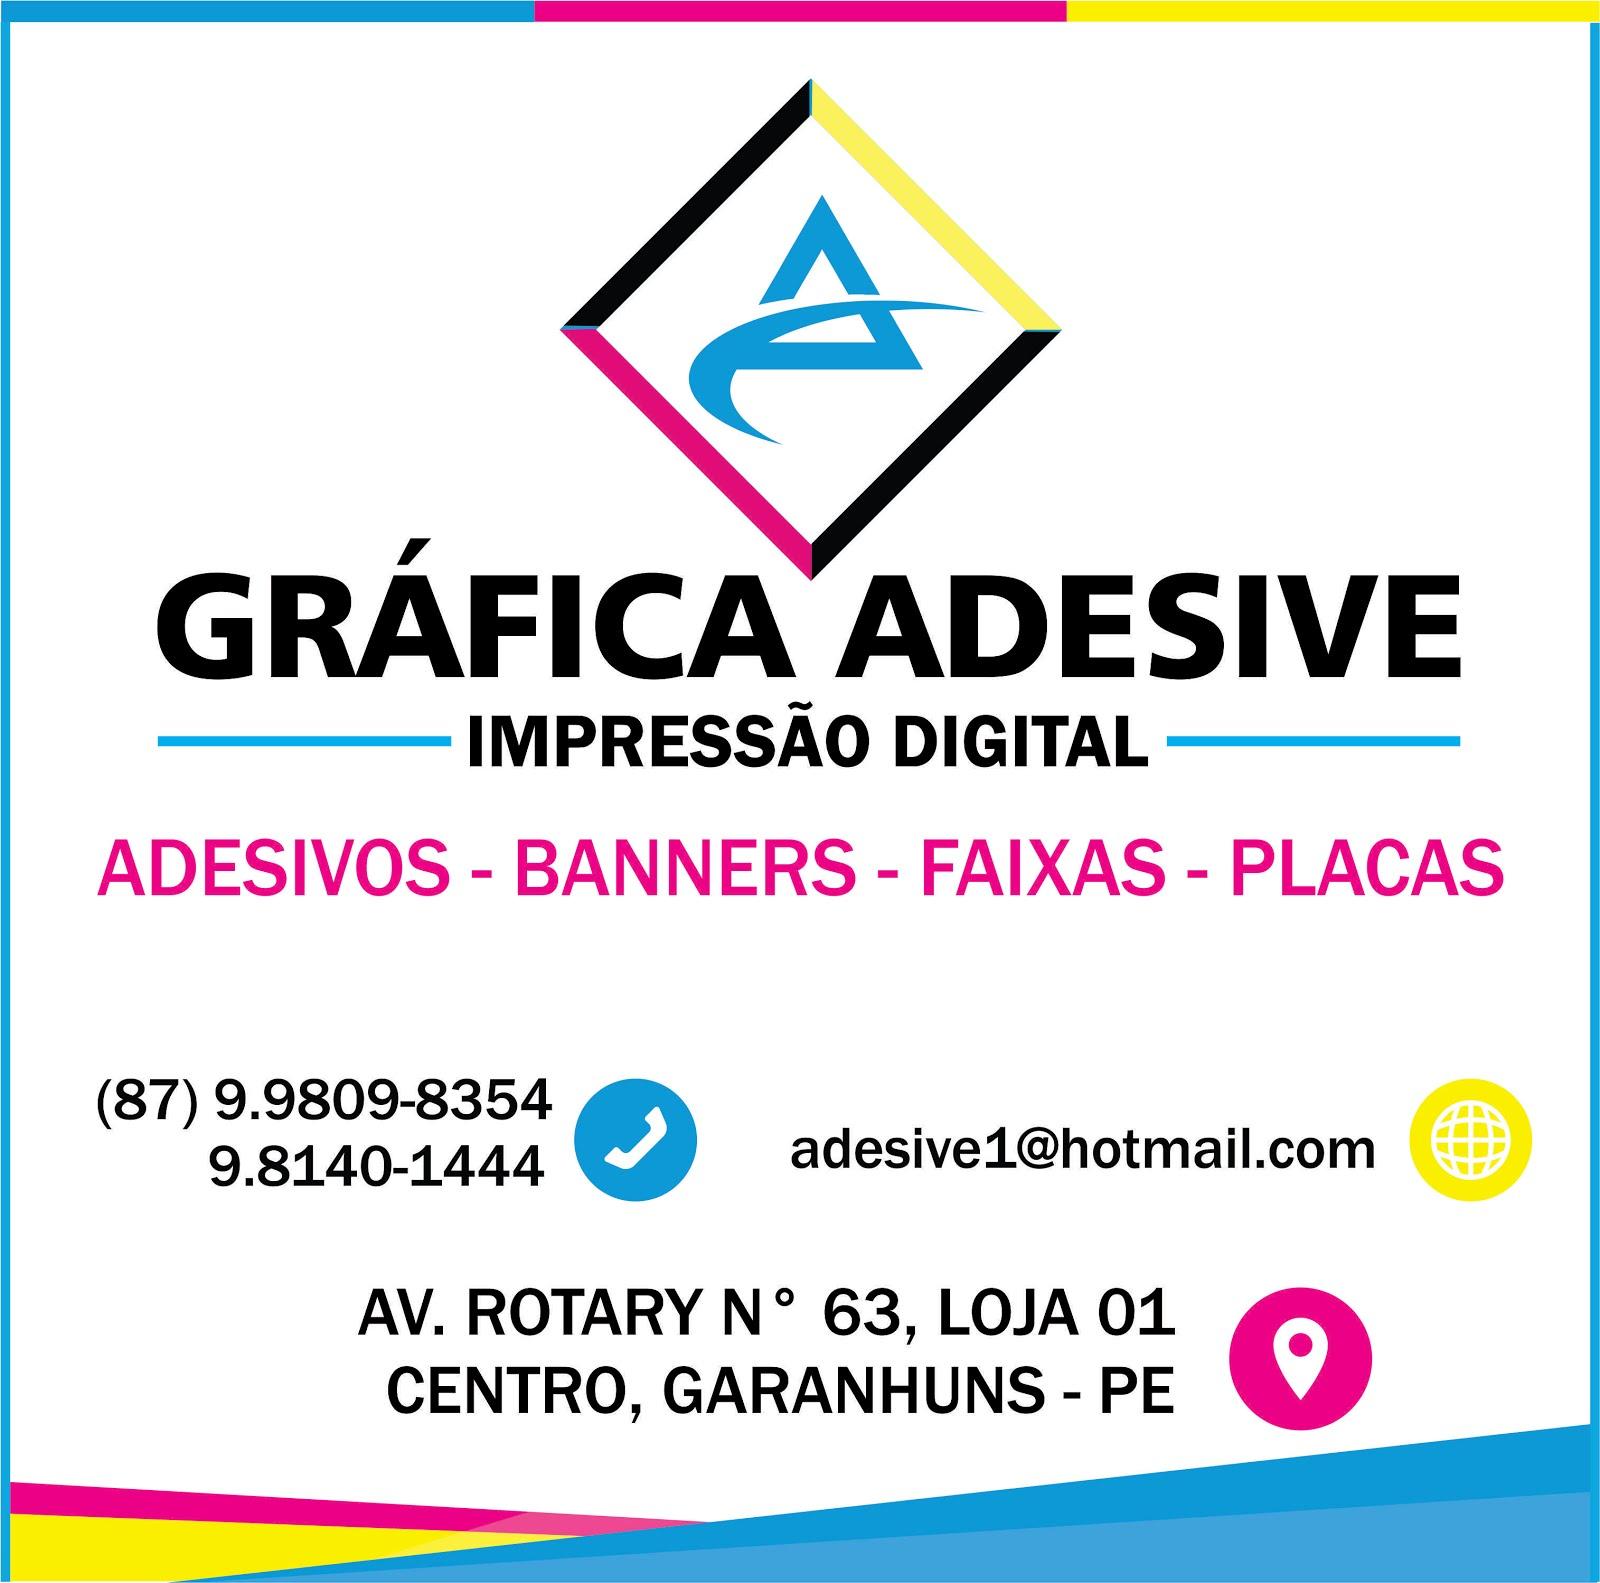 Gráfica Adesive